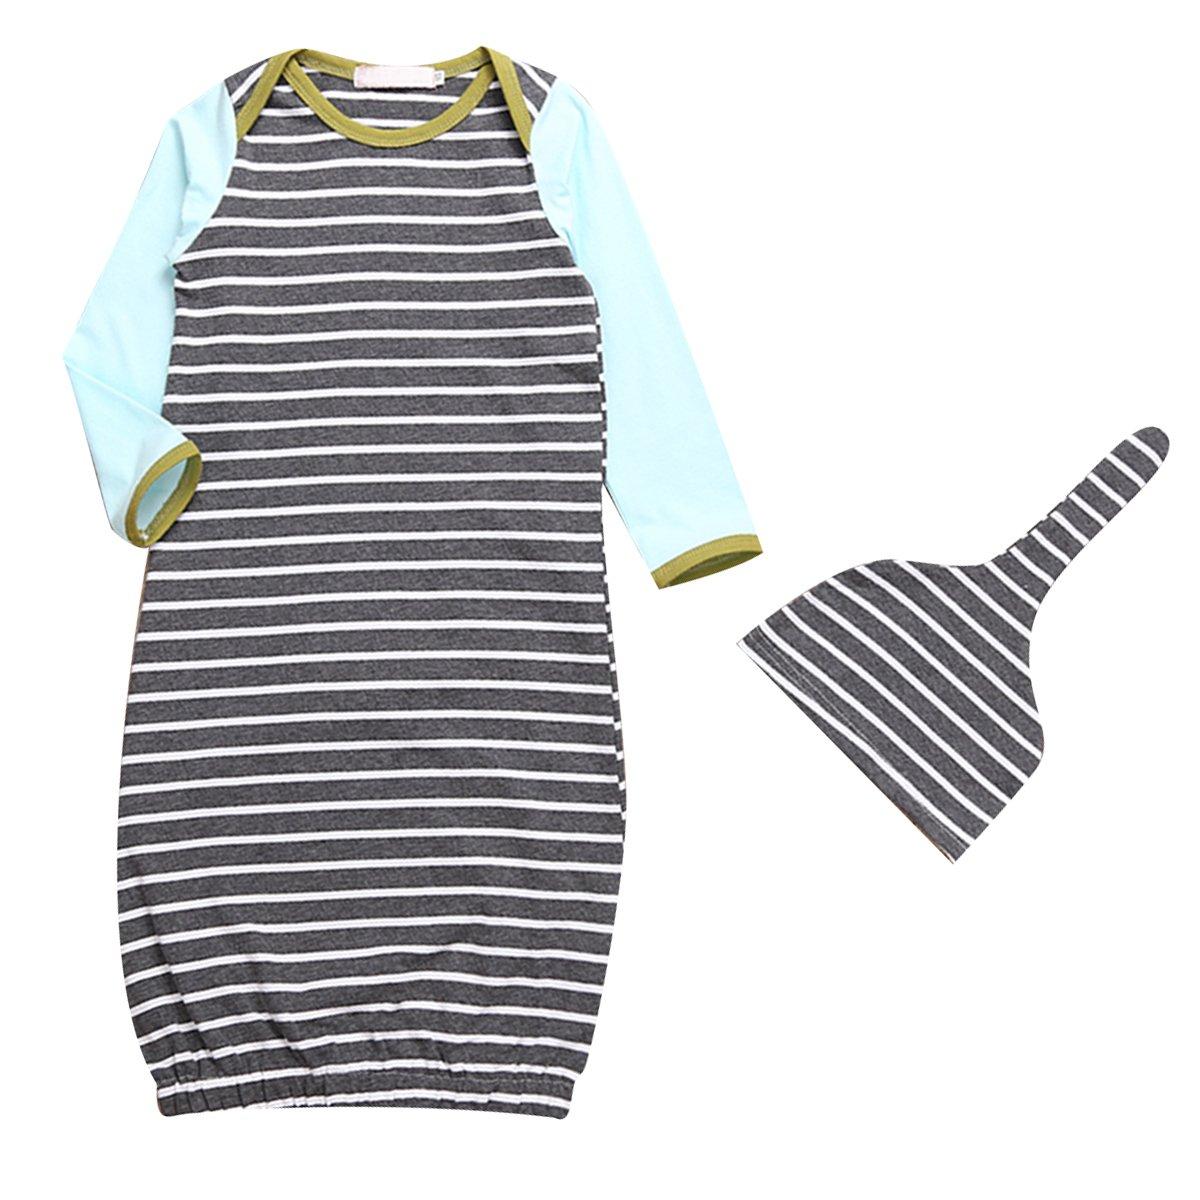 Ant-Kinds Baby Boy Girl Stripe Long Sleeve Night Gowns Sleeping Bag Pajamas Hat